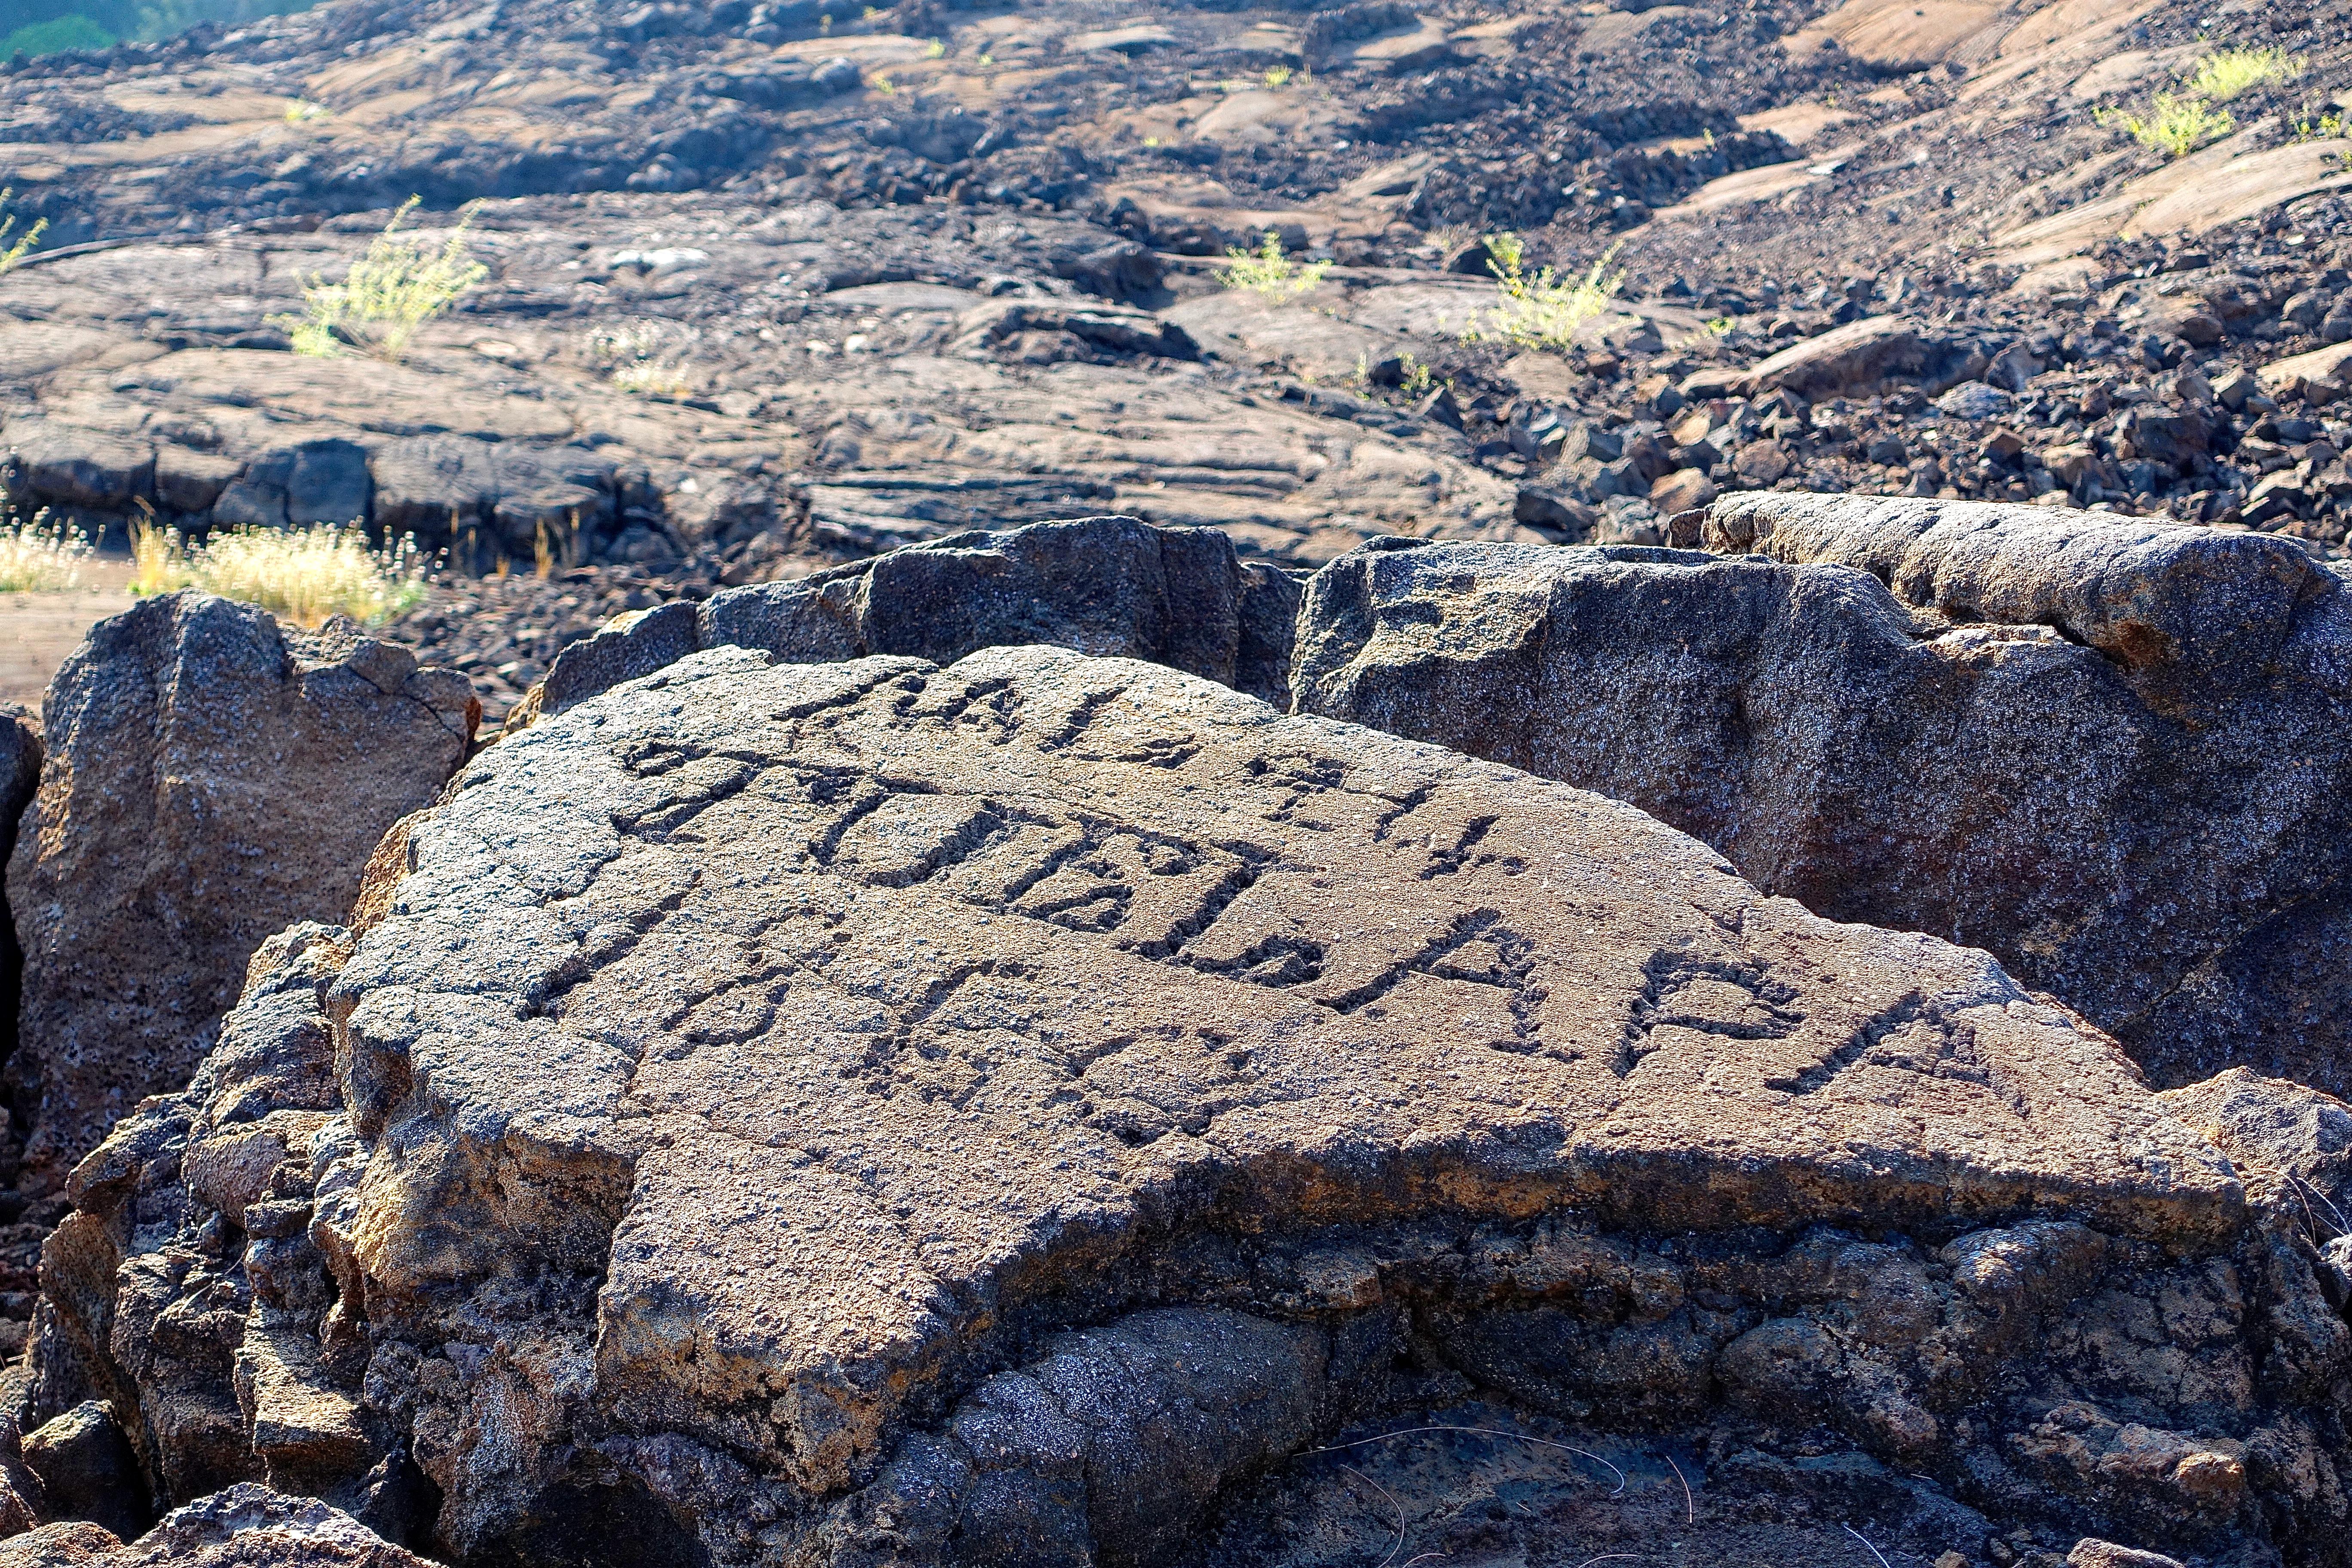 Petroglyph field near Waikoloa 8